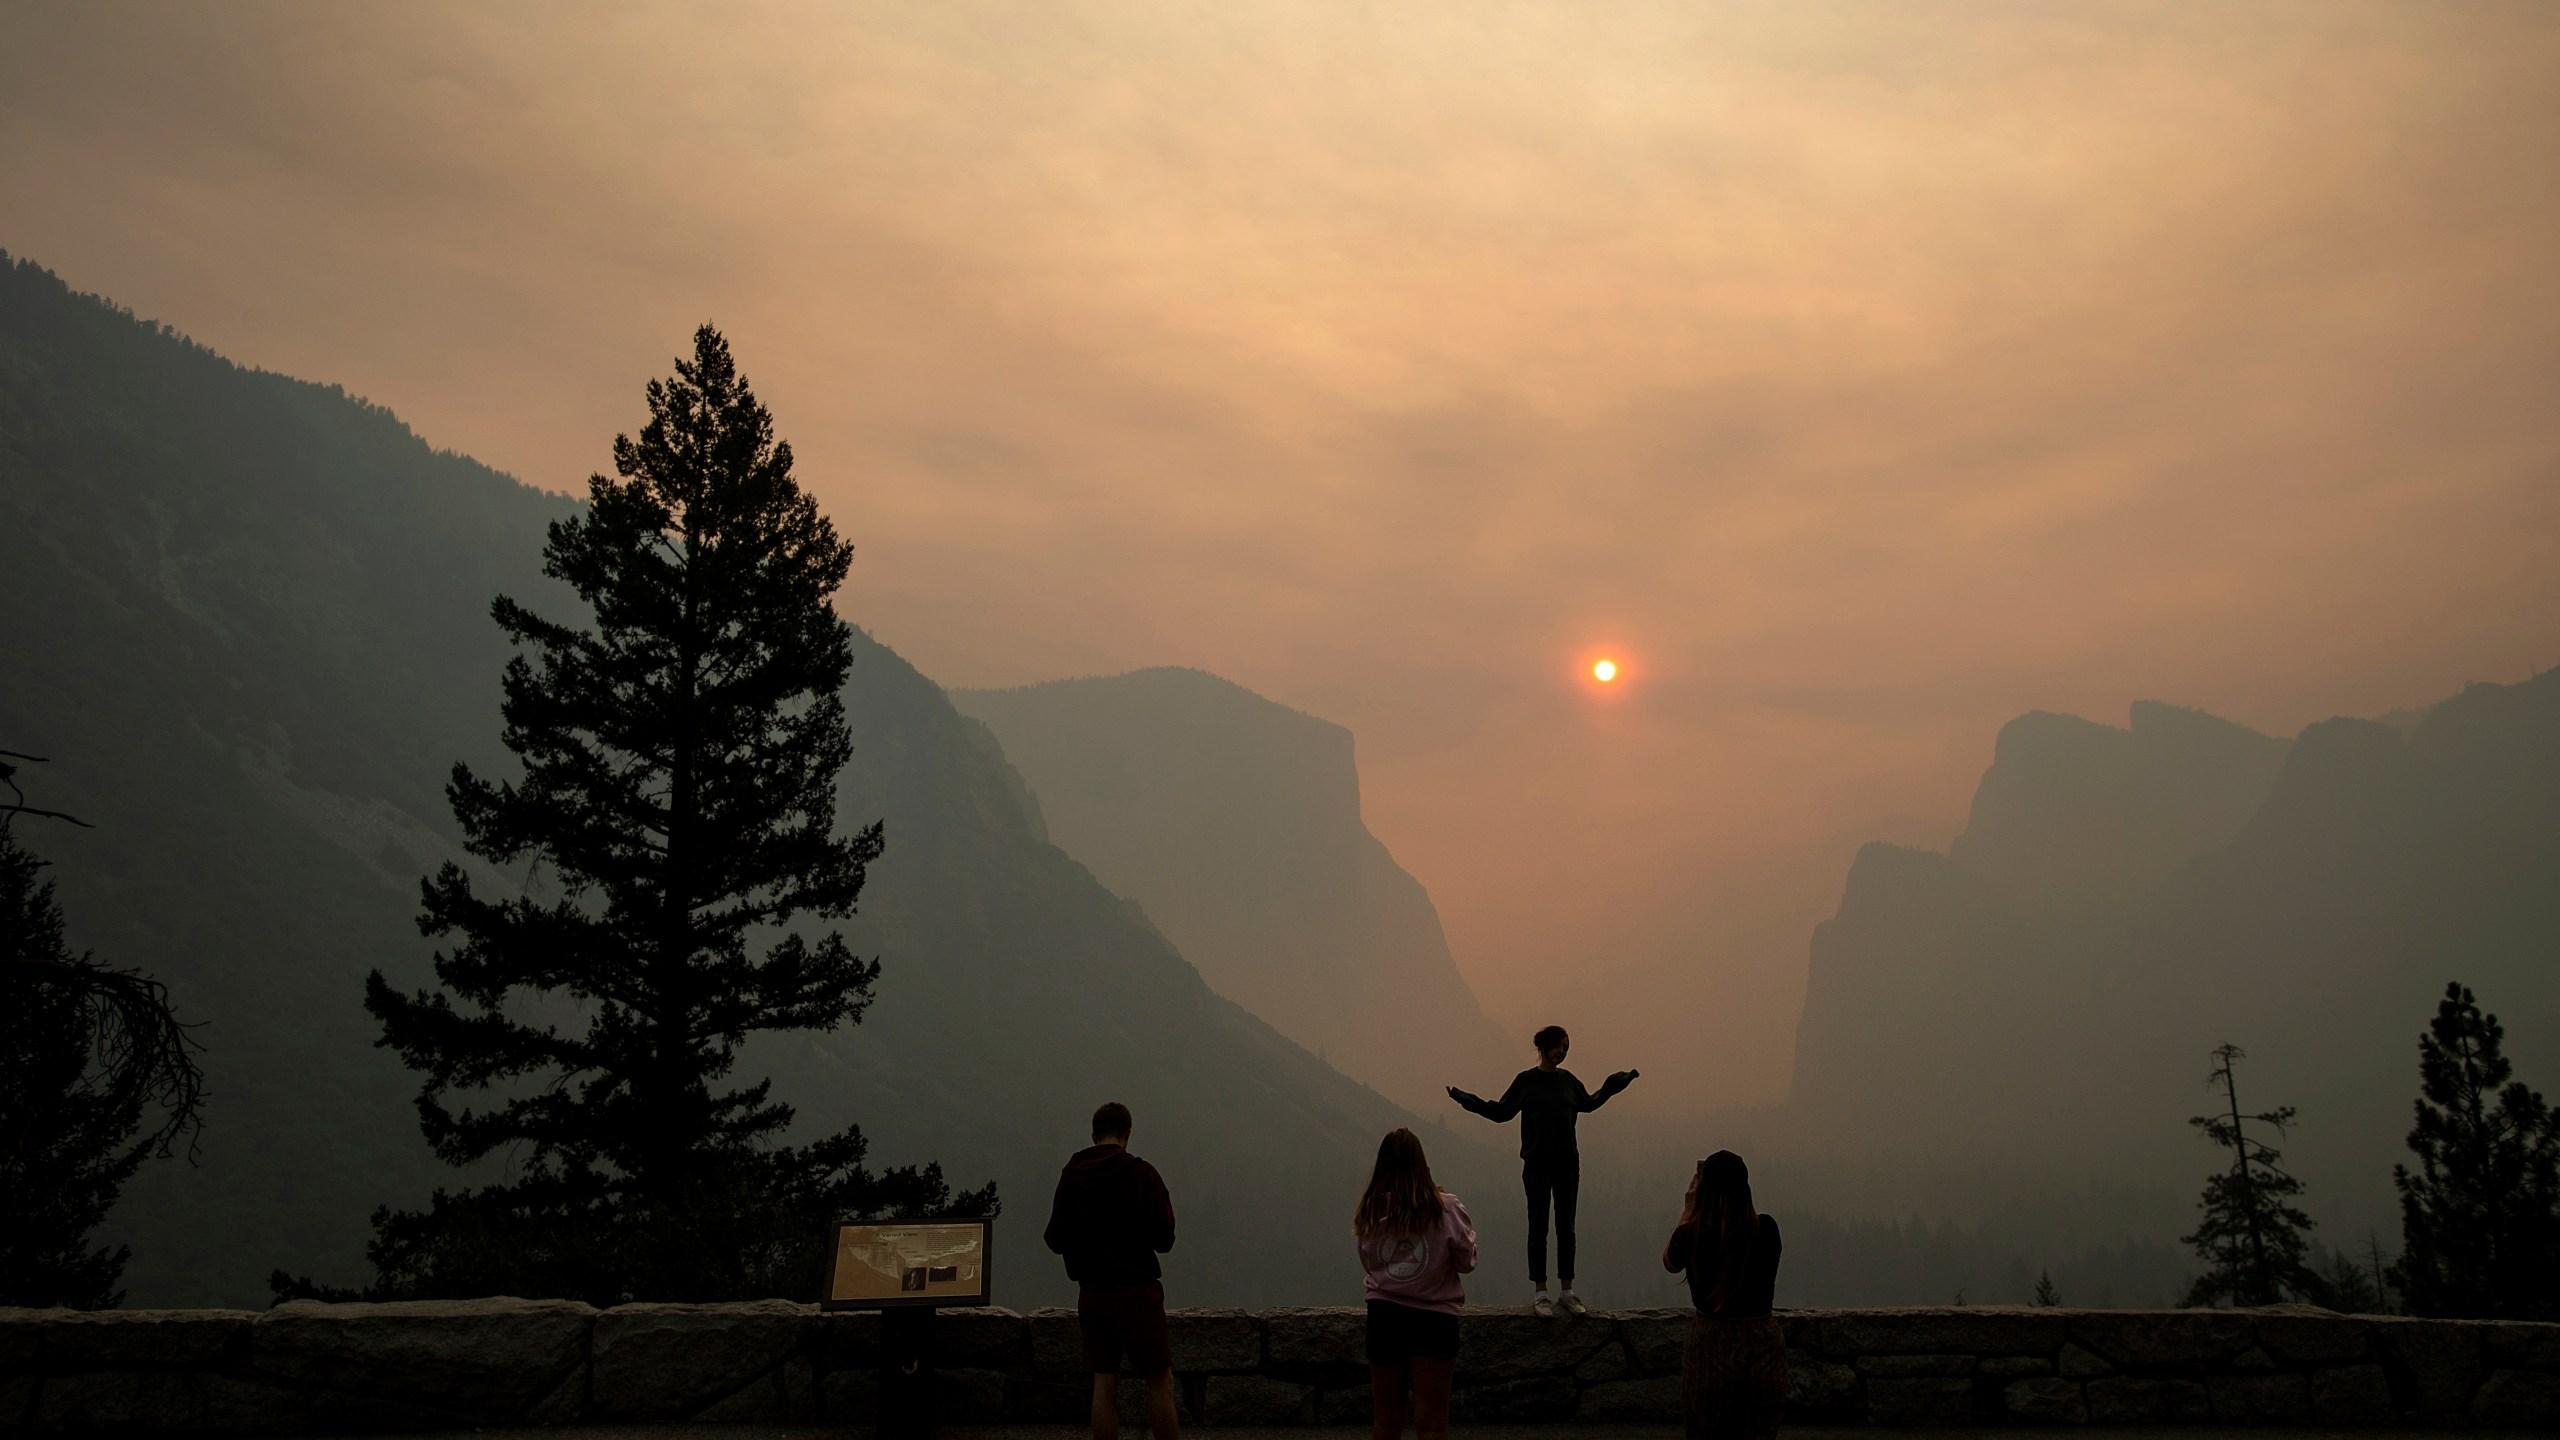 California_Wildfires_Yosemite_Closed_39137-159532.jpg43448730